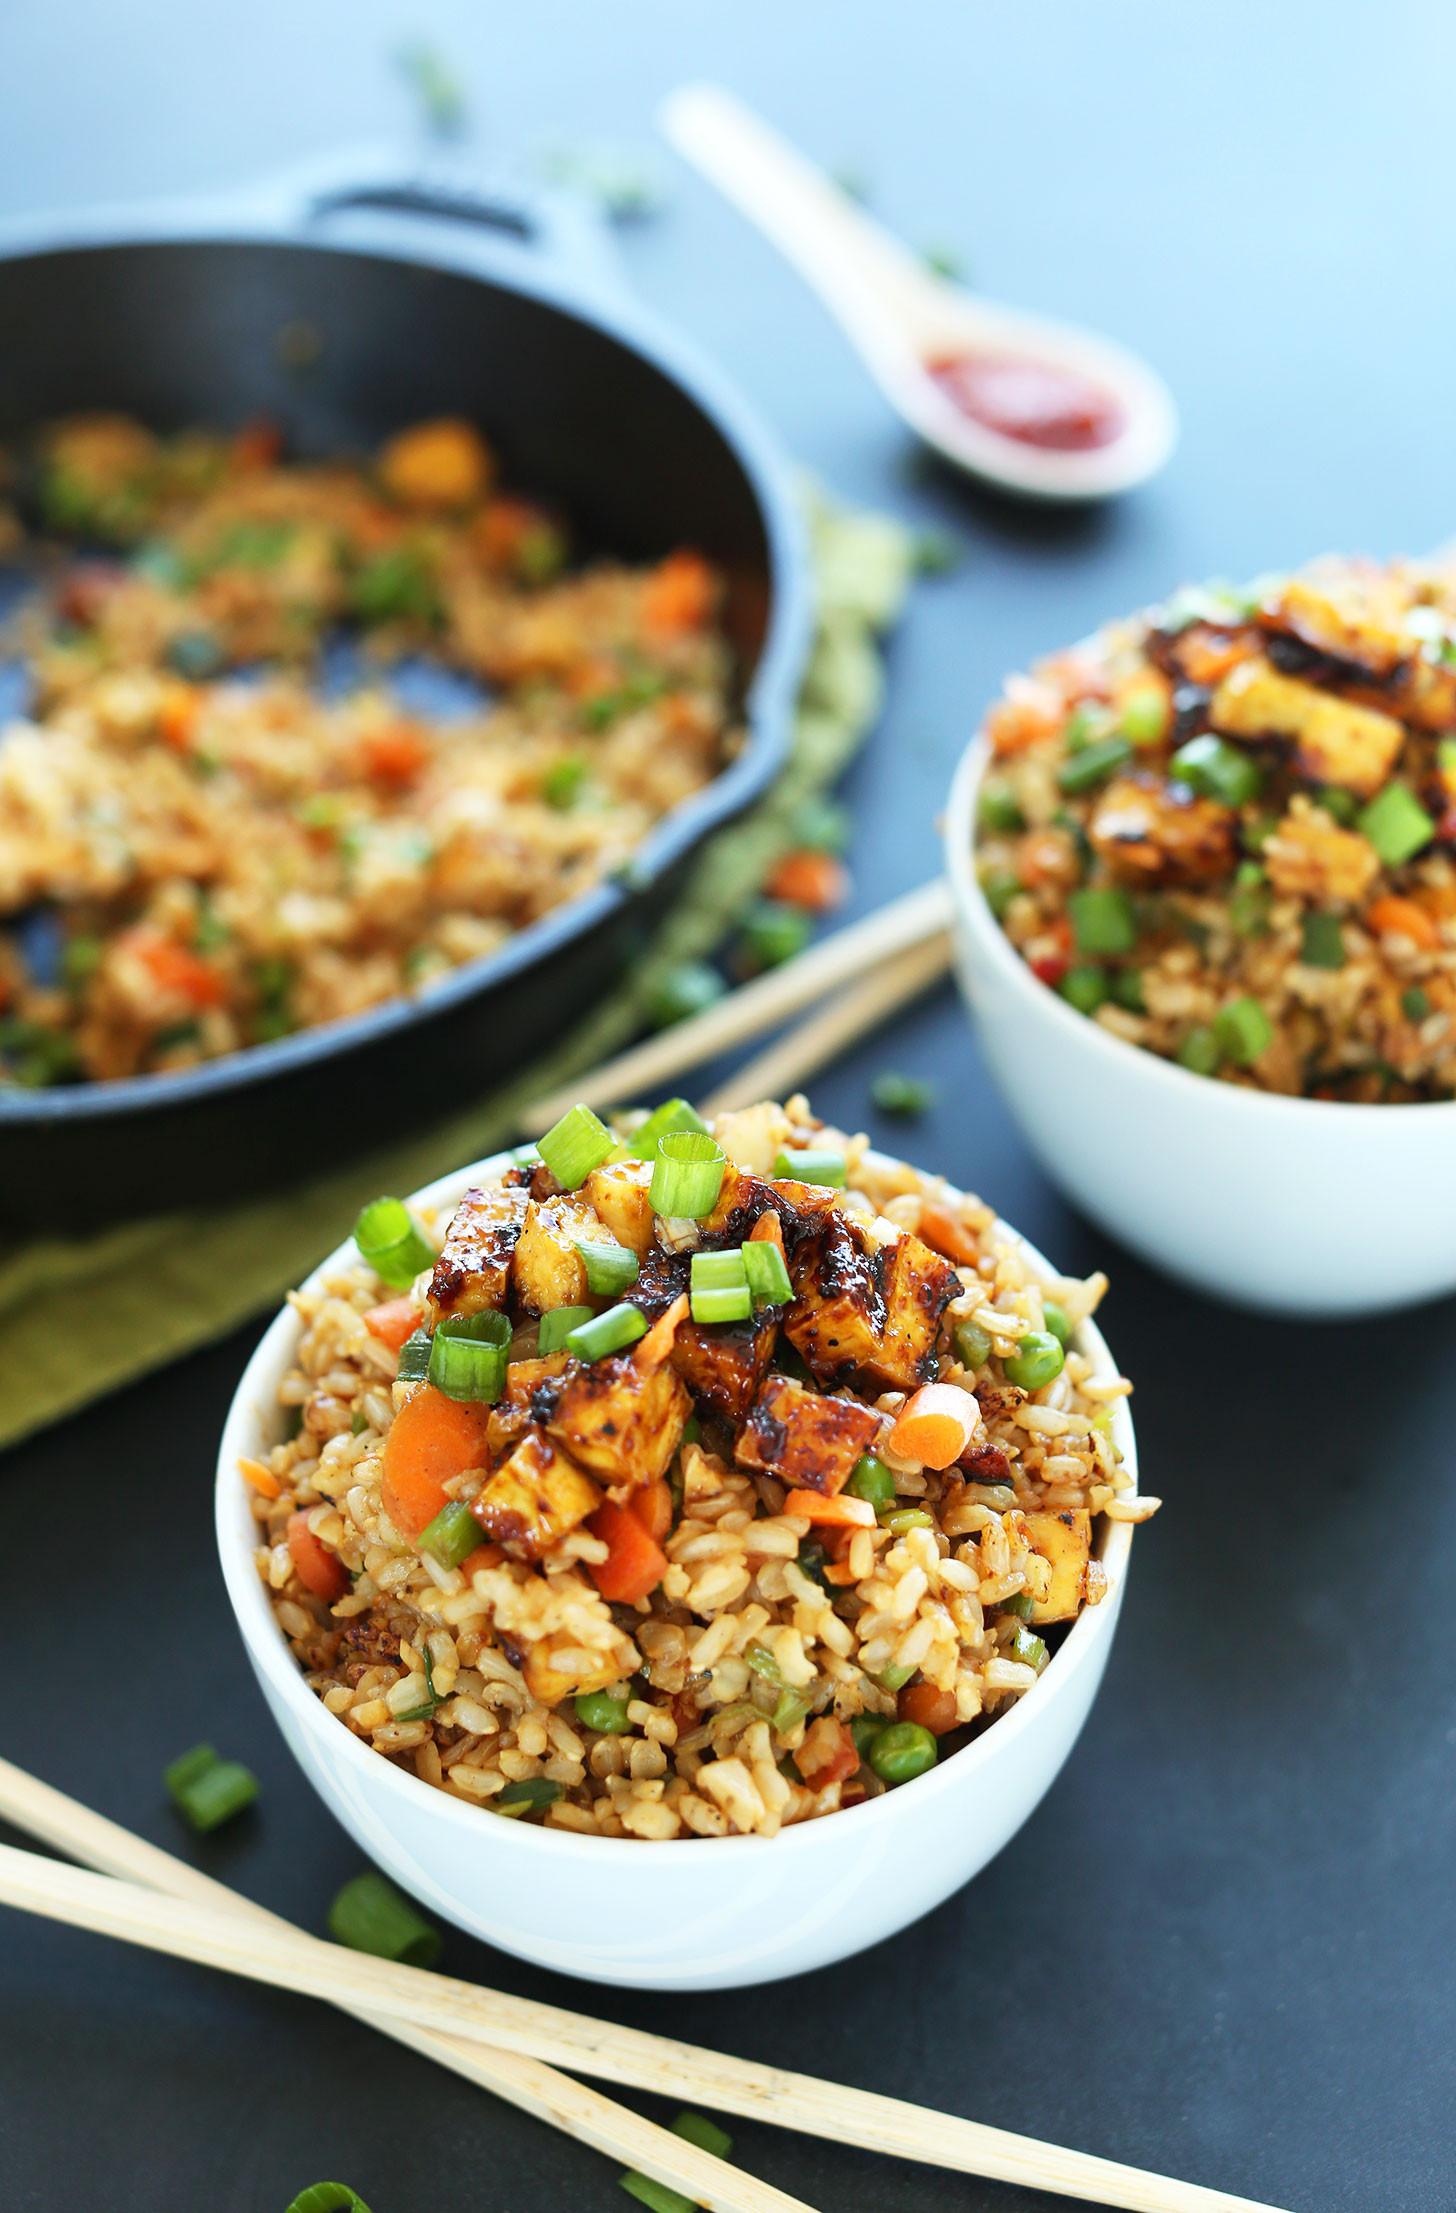 Simple Healthy Vegetarian Recipes  ve arian recipes easy